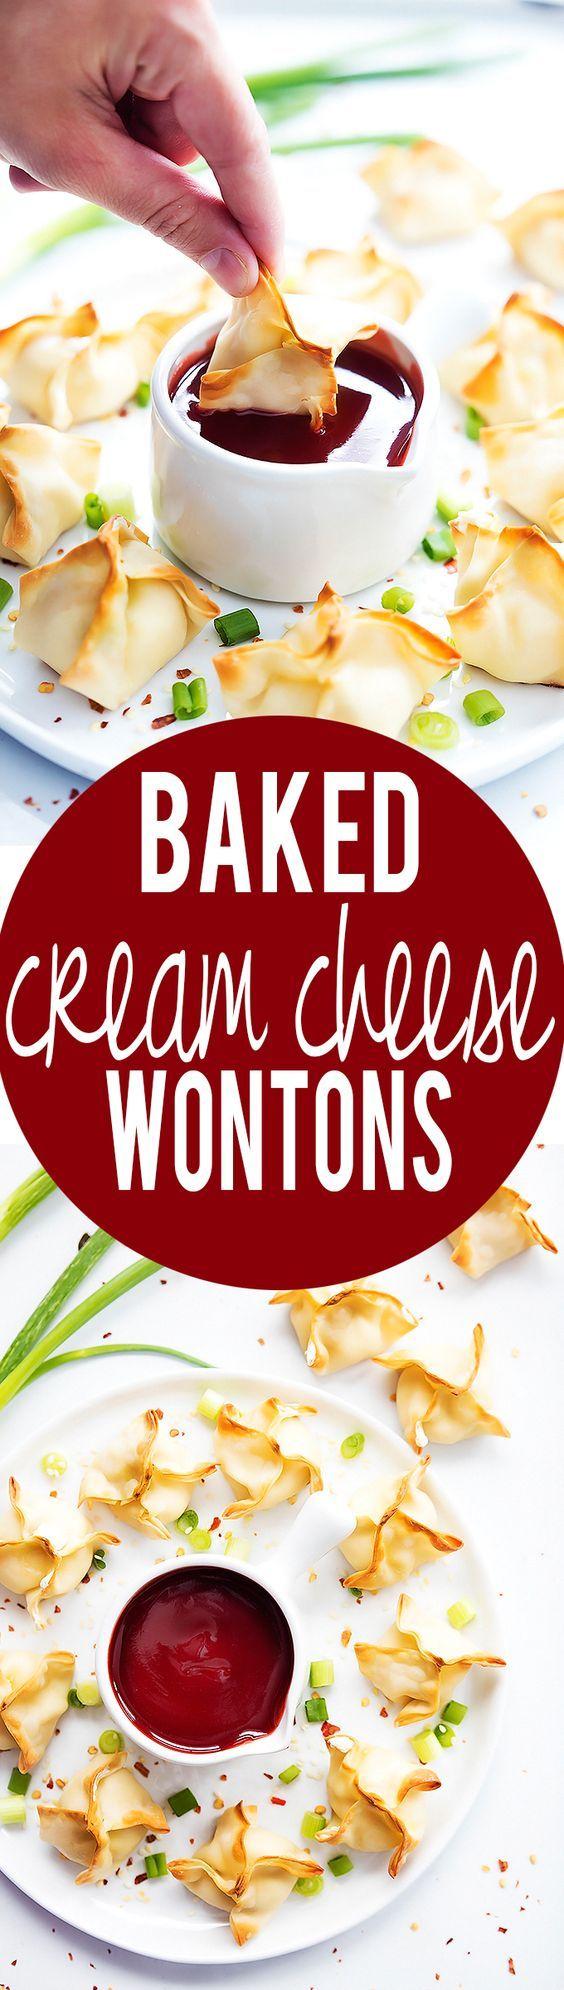 Healthier crispy Baked Cream Cheese Wontons {Rangoons} and the tastiest, easiest-ever homemade sweet + sour sauce! | Creme de la Crumb: